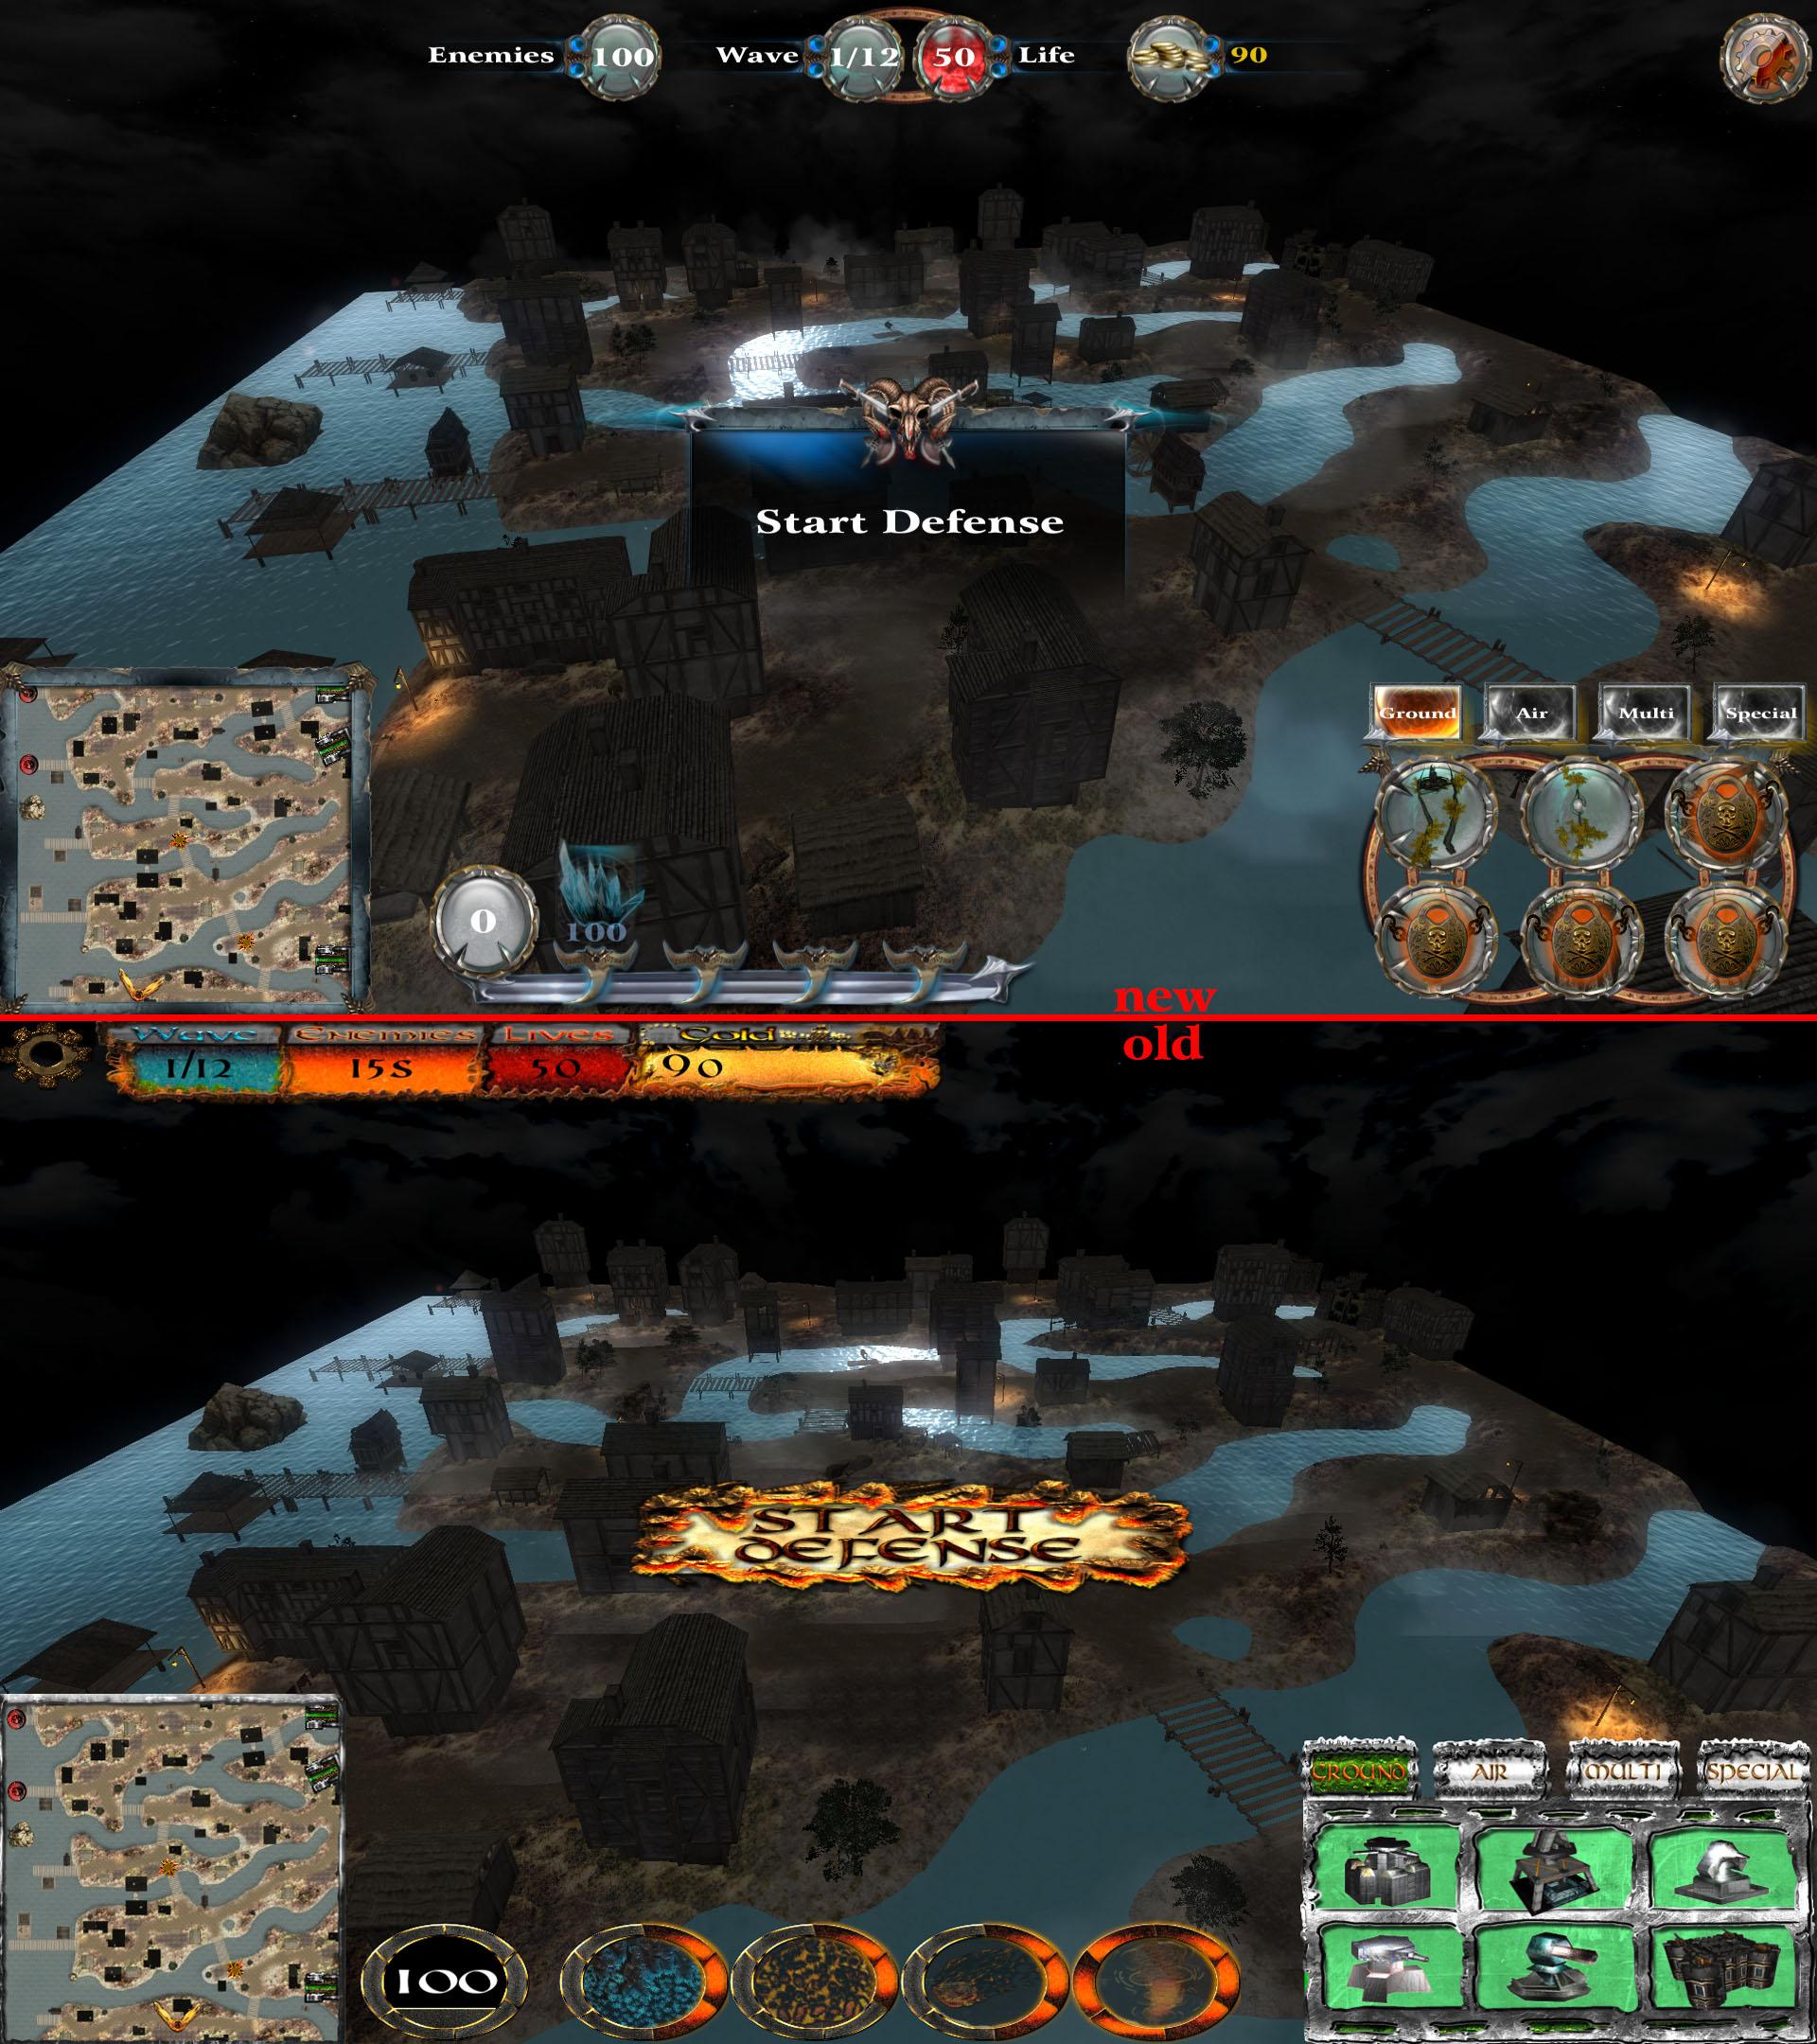 Interface comparison